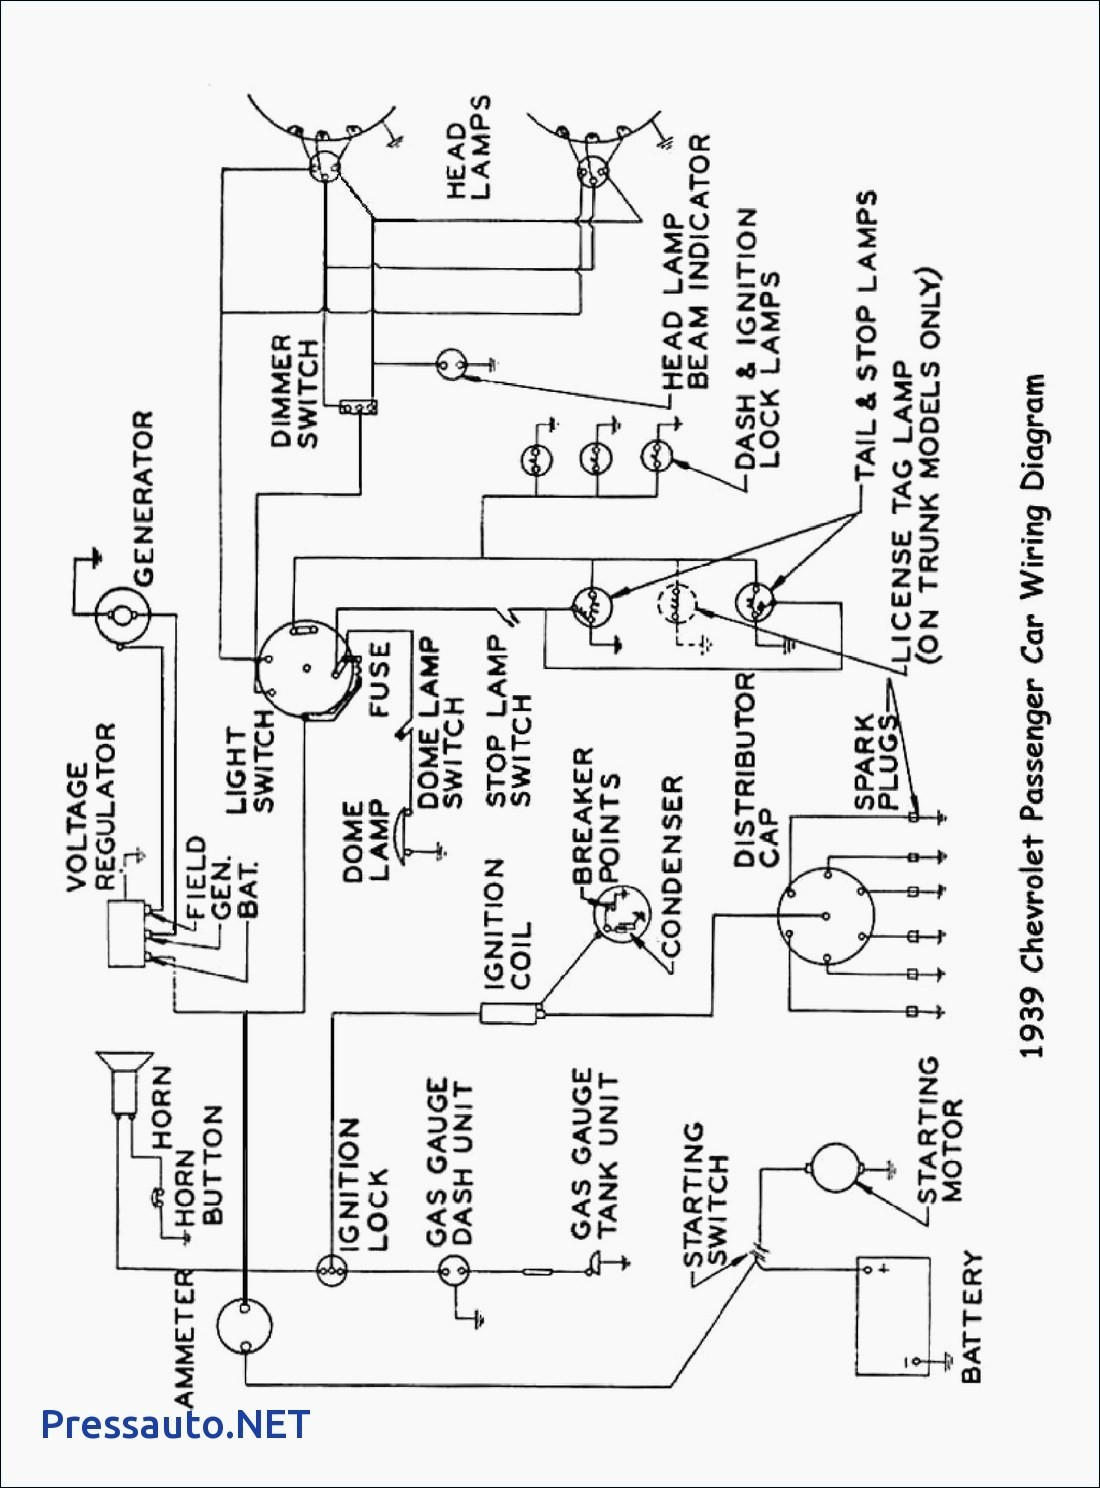 Jd 4430 Wiring Diagram  John Deere 4430 4630 Tractors Tm1172 Pdf Manual  John Deere 4430 Wiring